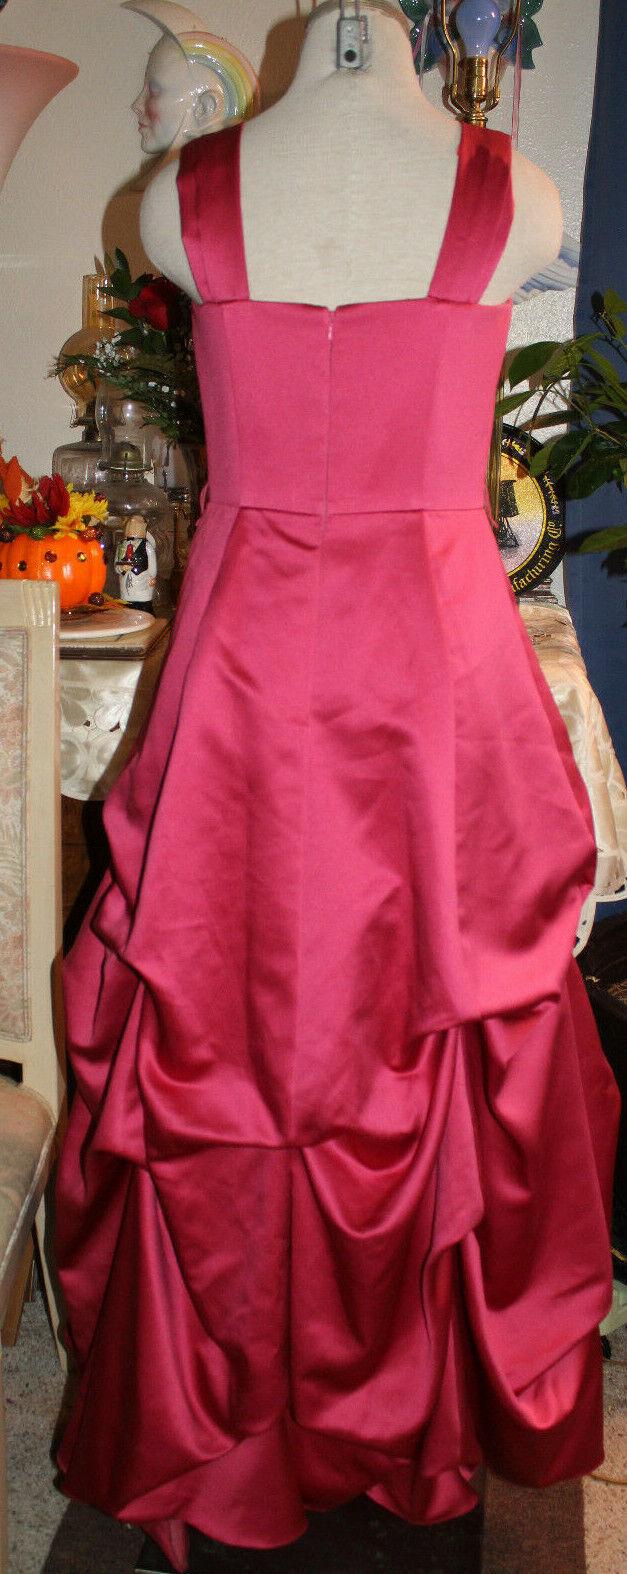 Davids bridal bridal bridal pink satin wedding prom bridesmaids formal evening long dress 8 c57078